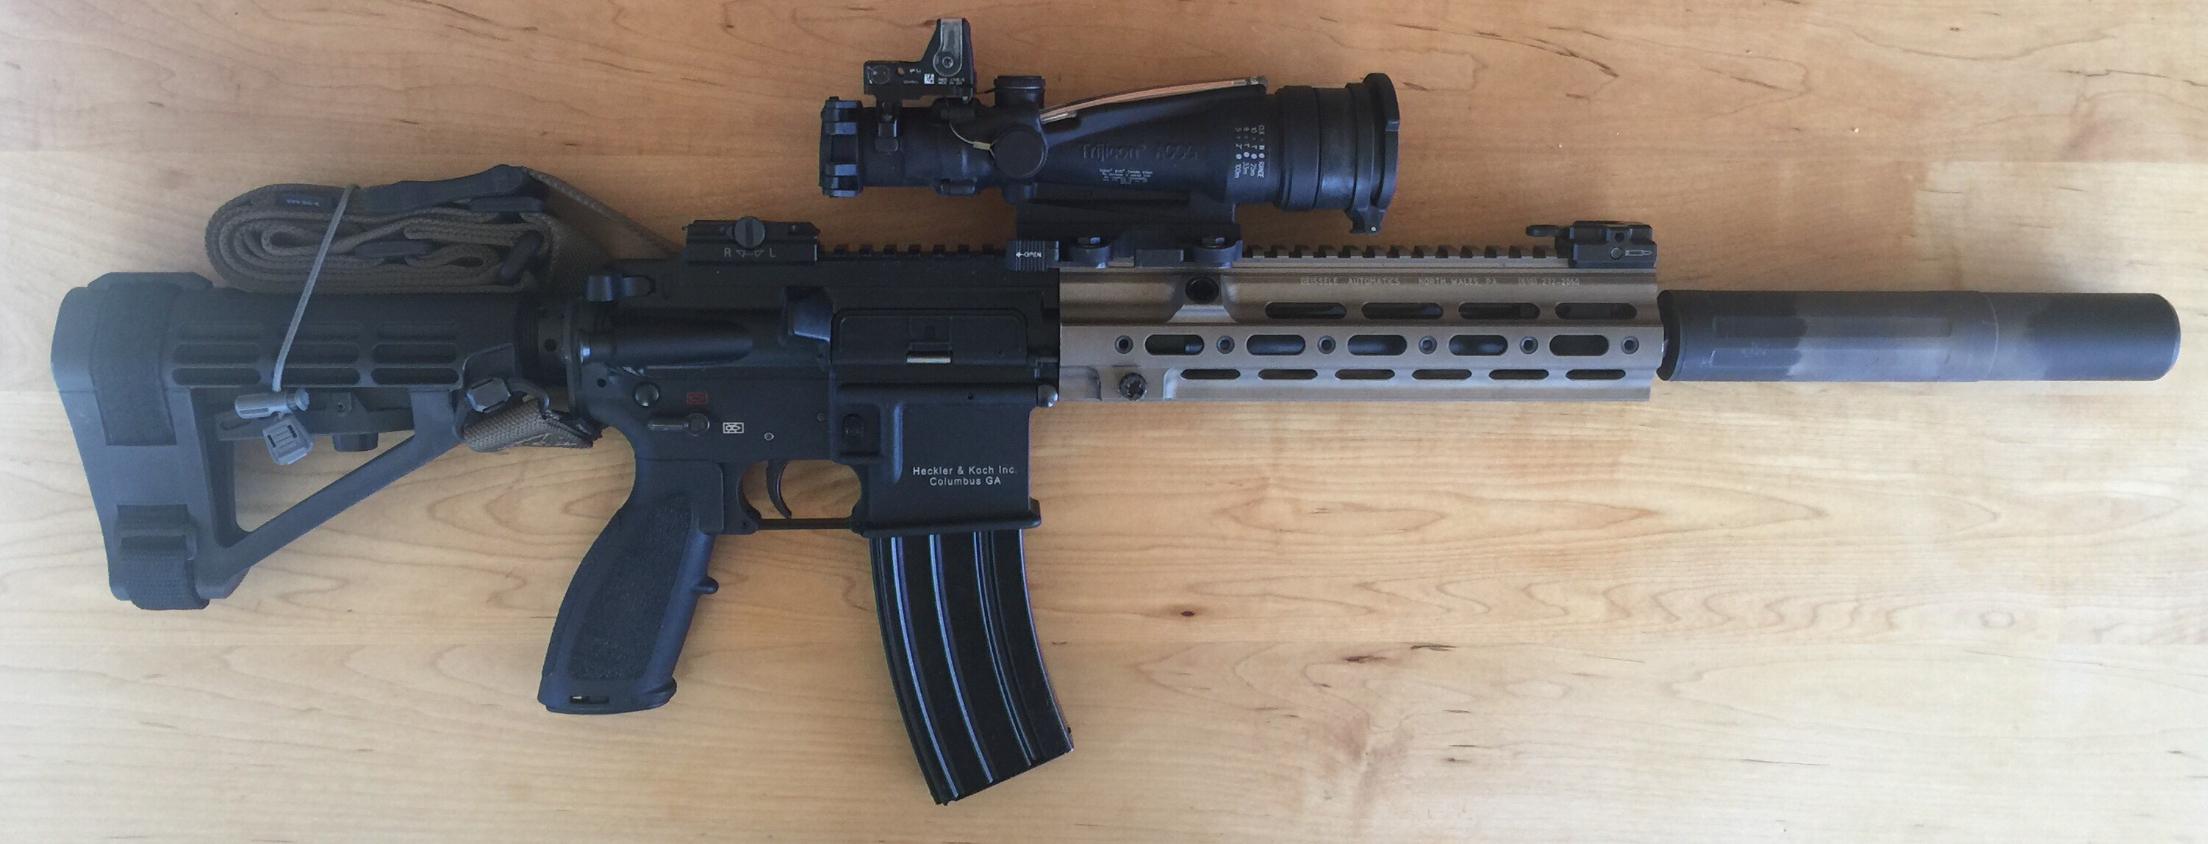 HK416 Owners Picture Thread (genuine HK416's only please)-b0c665c4-8b6e-40fc-87eb-6632042e5171_1572909636097.jpeg